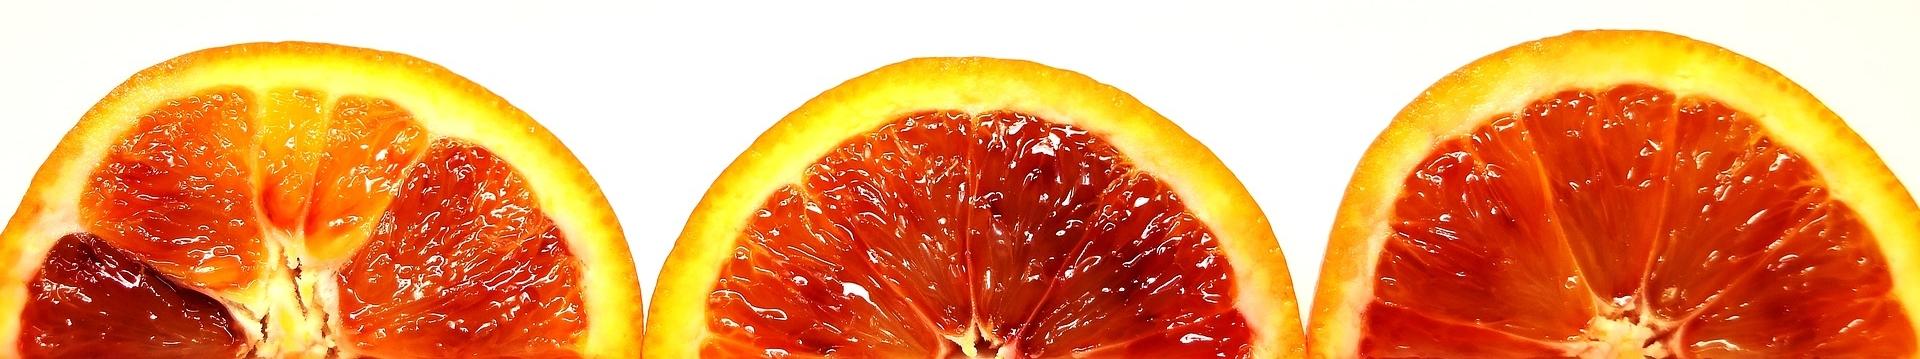 blood-orange-3170632_1920.jpg